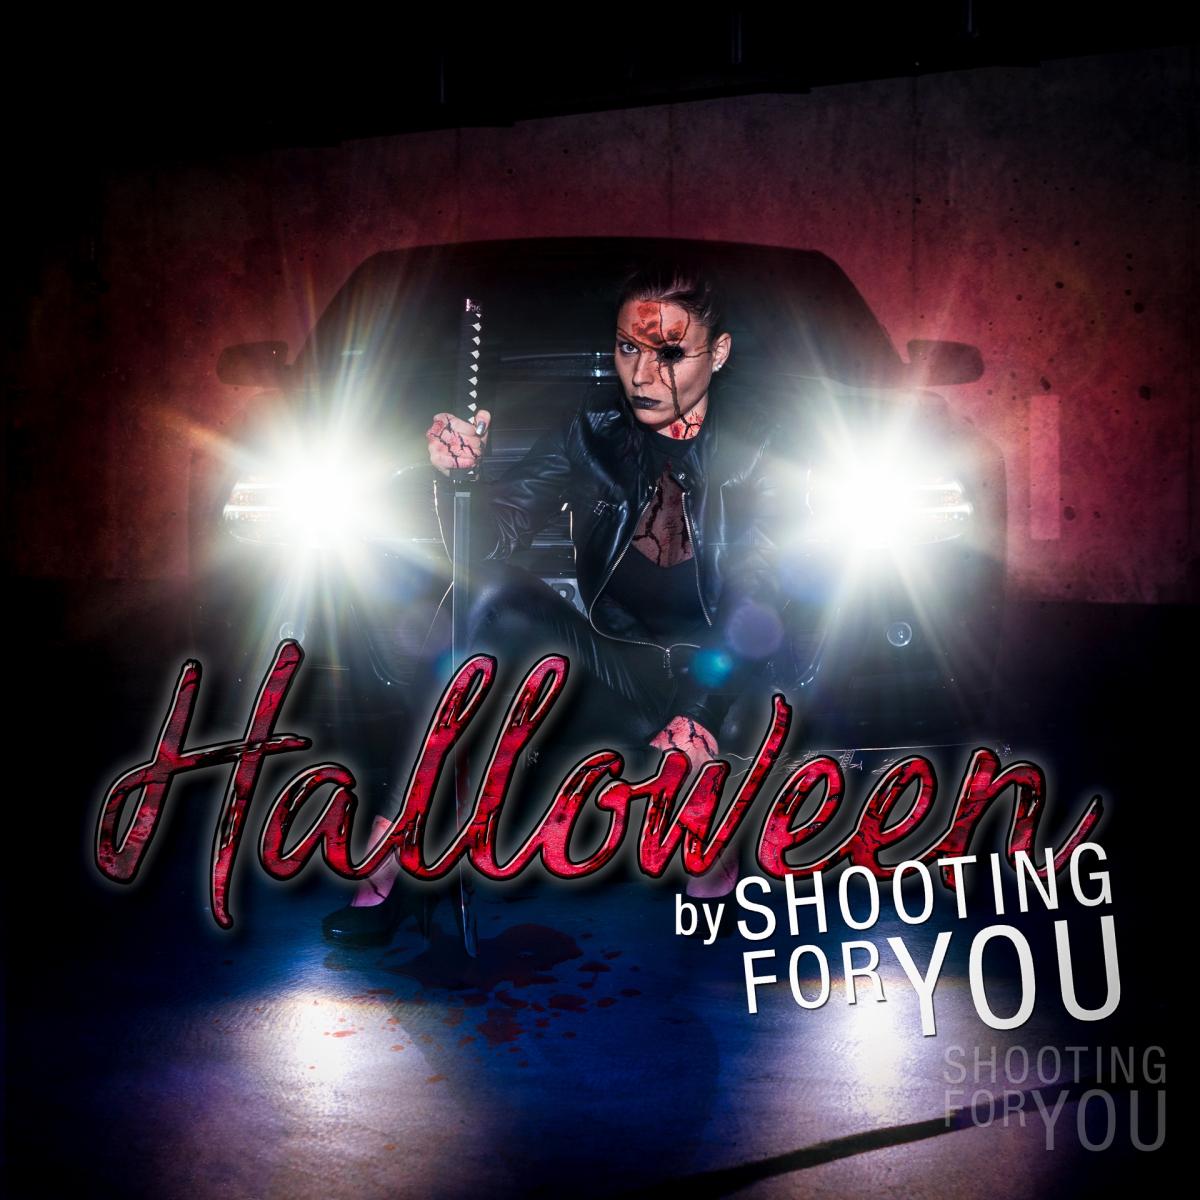 Reinhard-Schlegel_by_ShootingForYou_0142